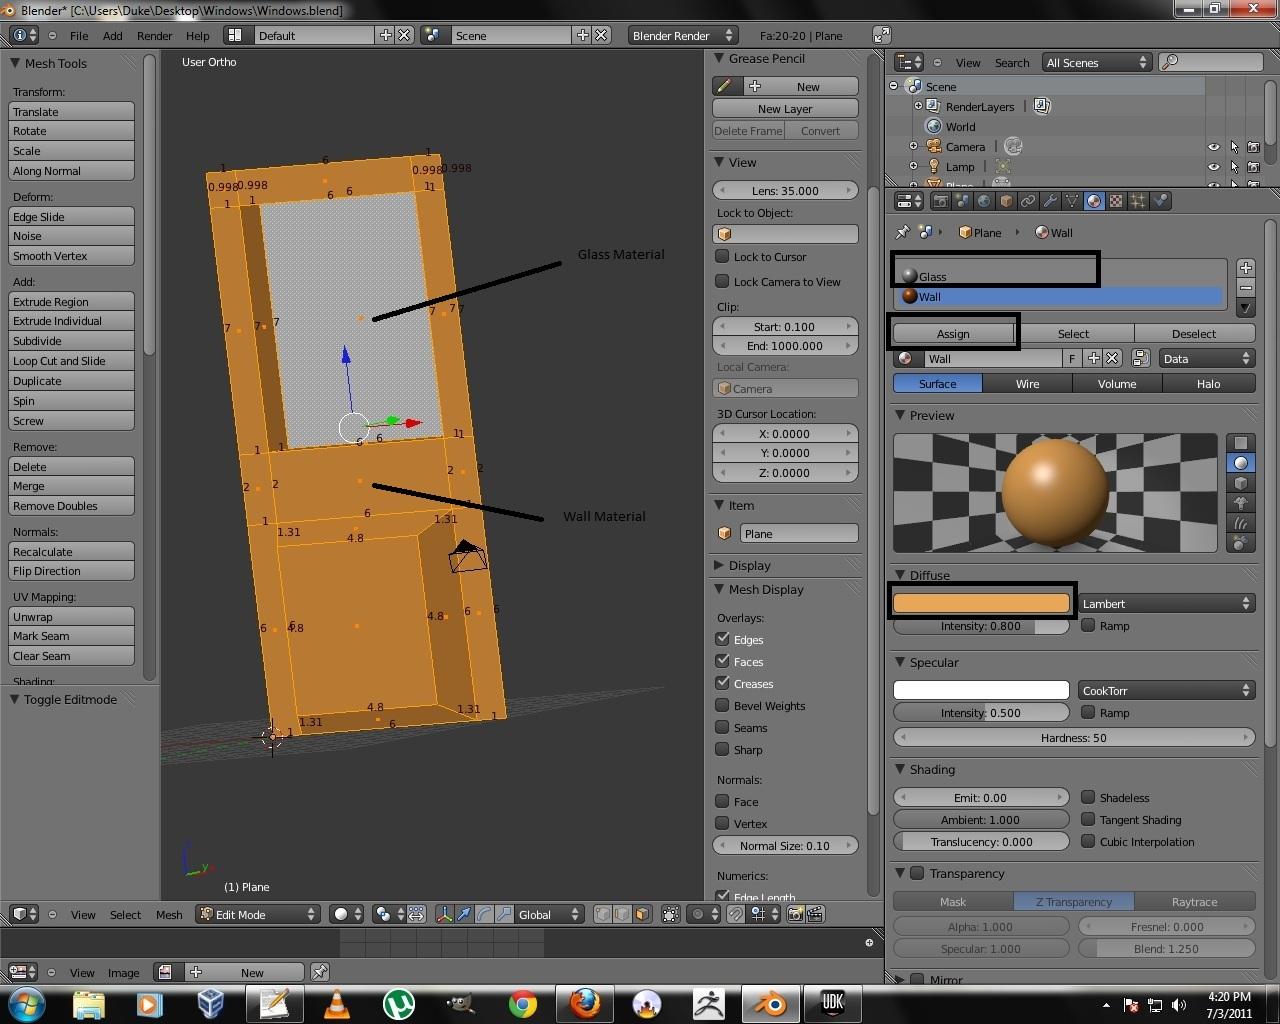 Blender Low Poly Window Texturing & Unwrap